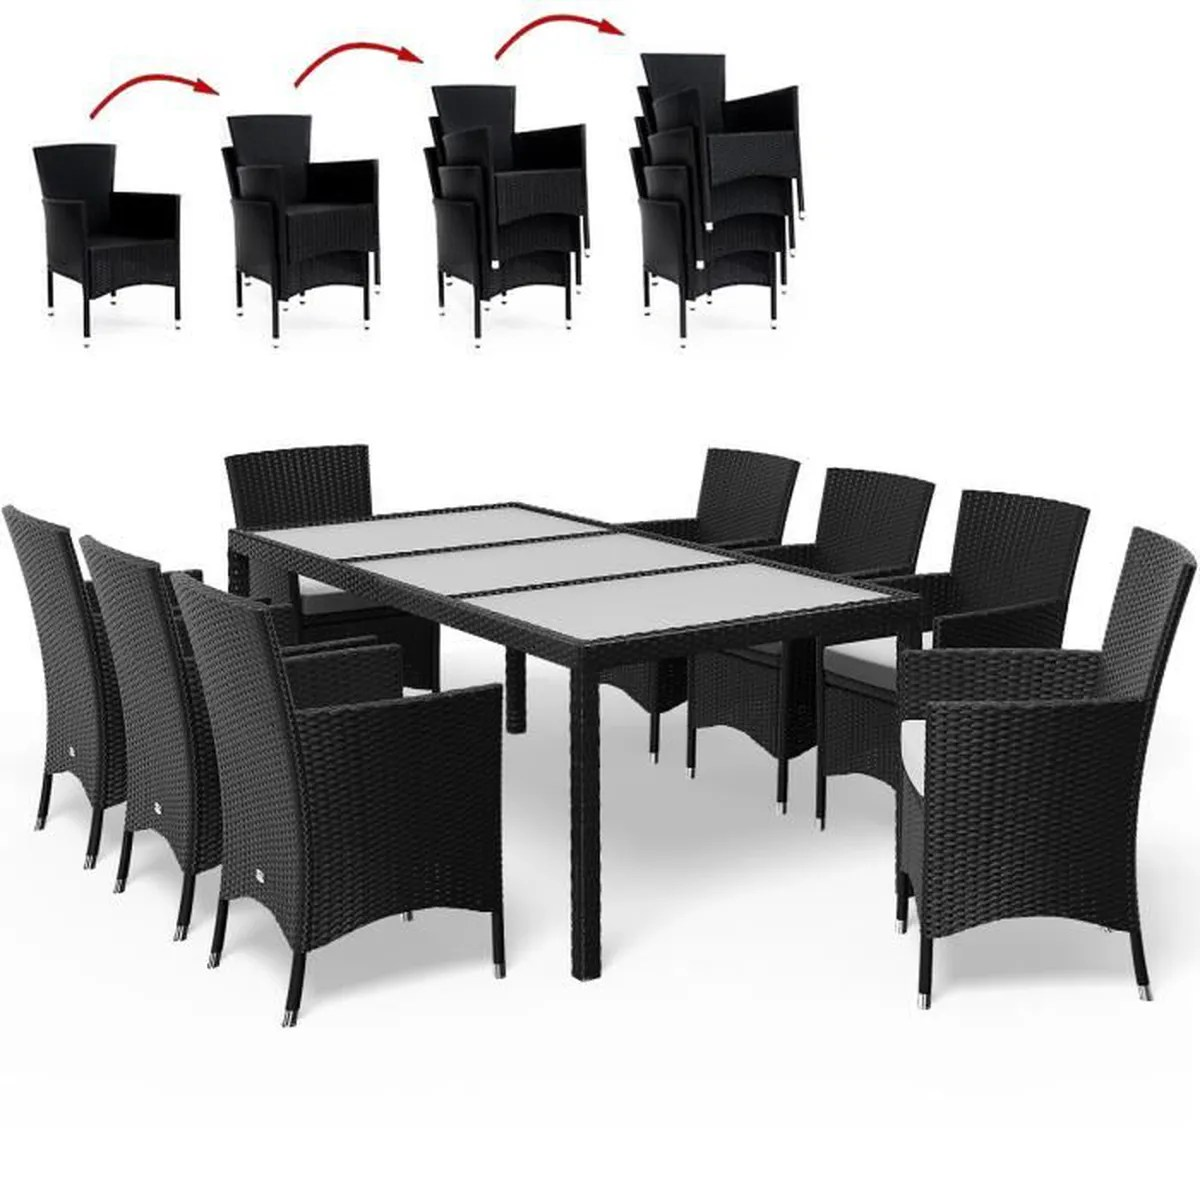 Table Exterieur Jardin | Eclairage Exterieur Jardin Gifi